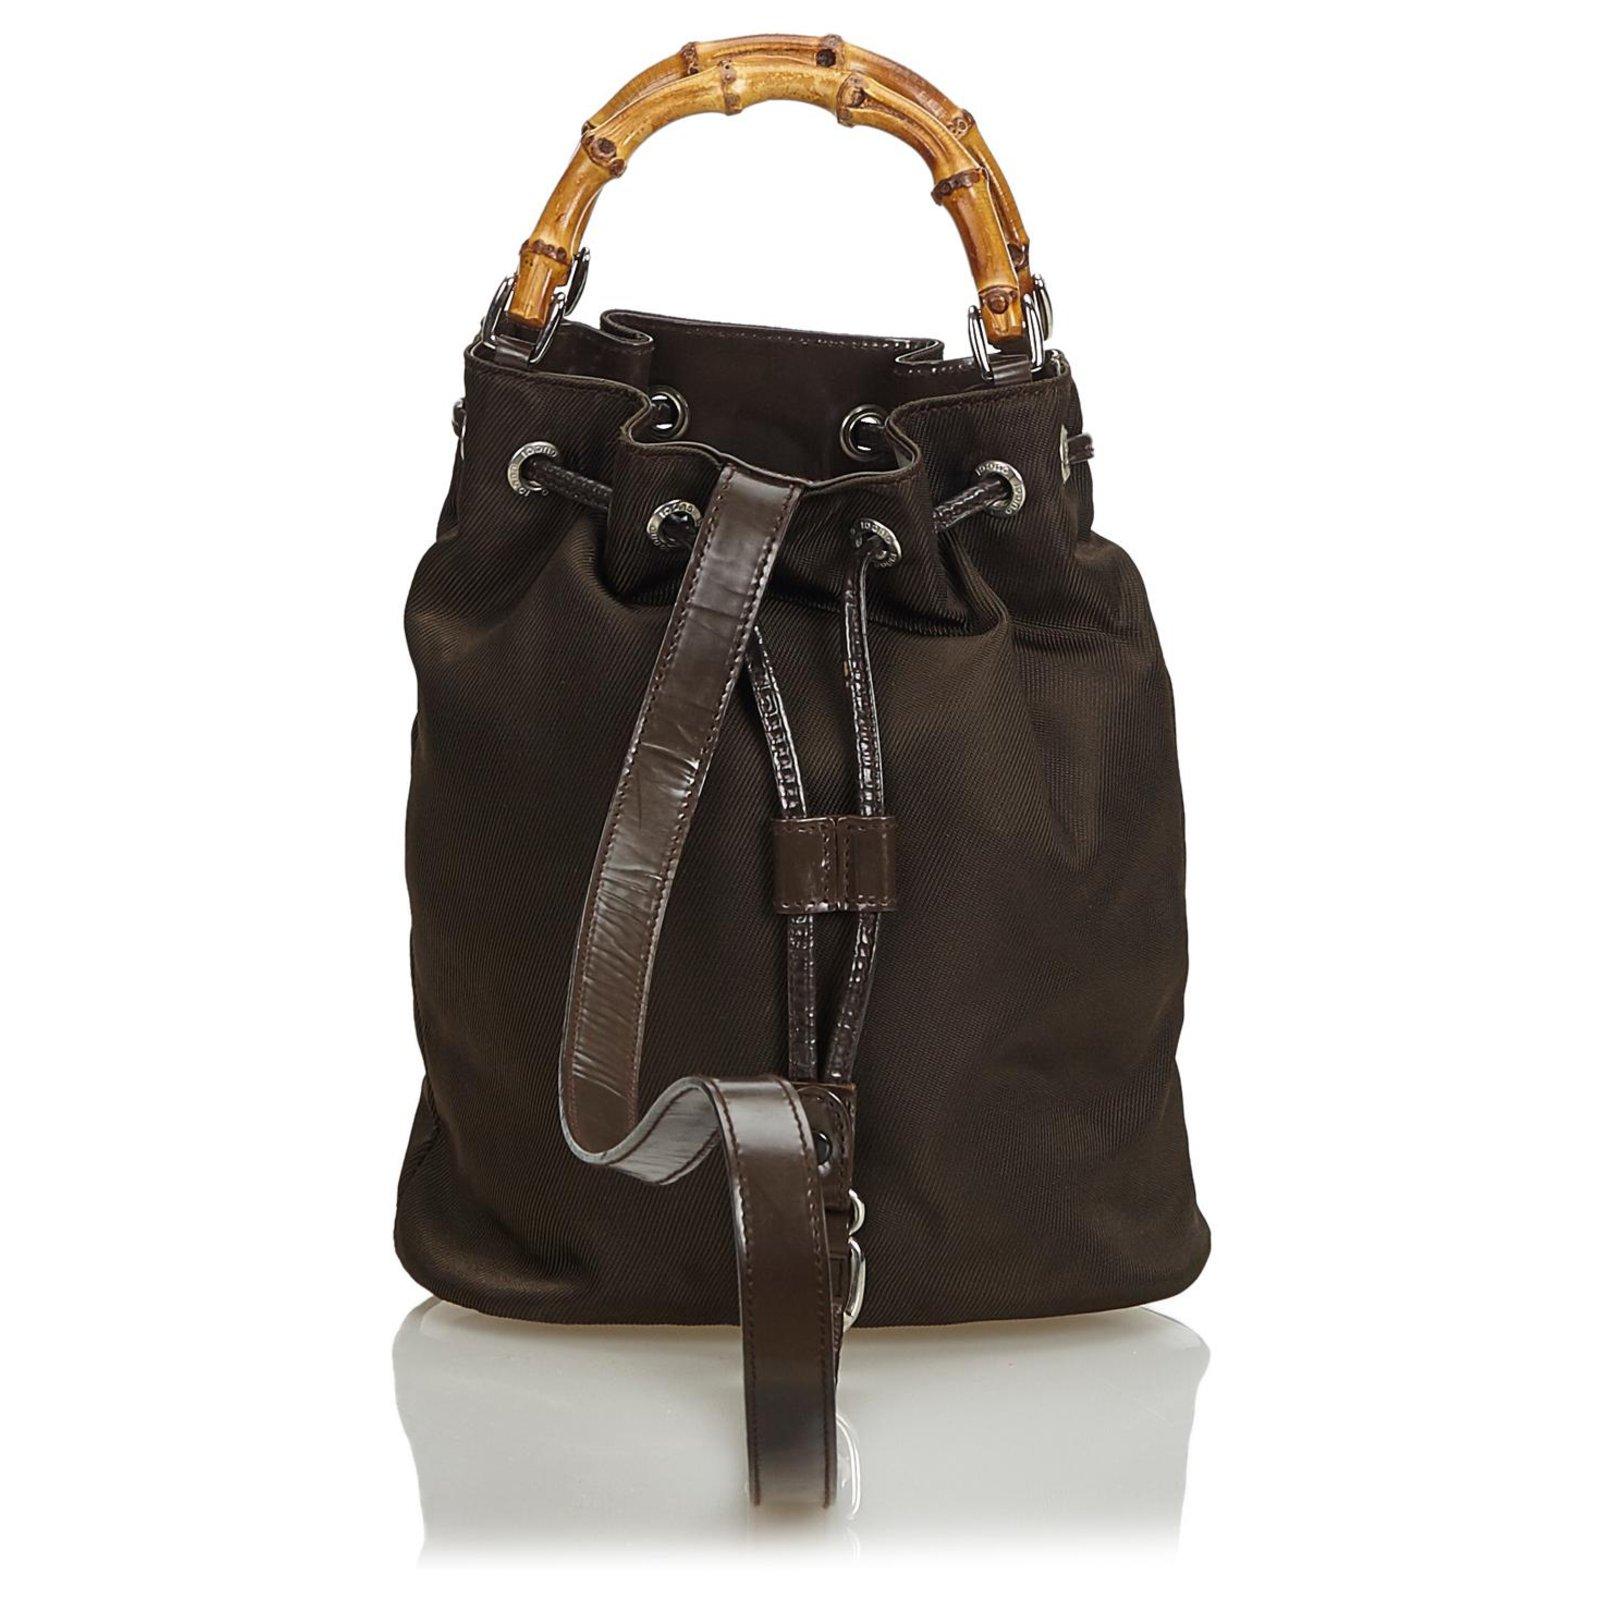 8340f28813285e Gucci Gucci Brown Bamboo Nylon Drawstring Backpack Backpacks Leather,Other, Nylon,Cloth Brown,Beige,Dark brown ref.125787 - Joli Closet